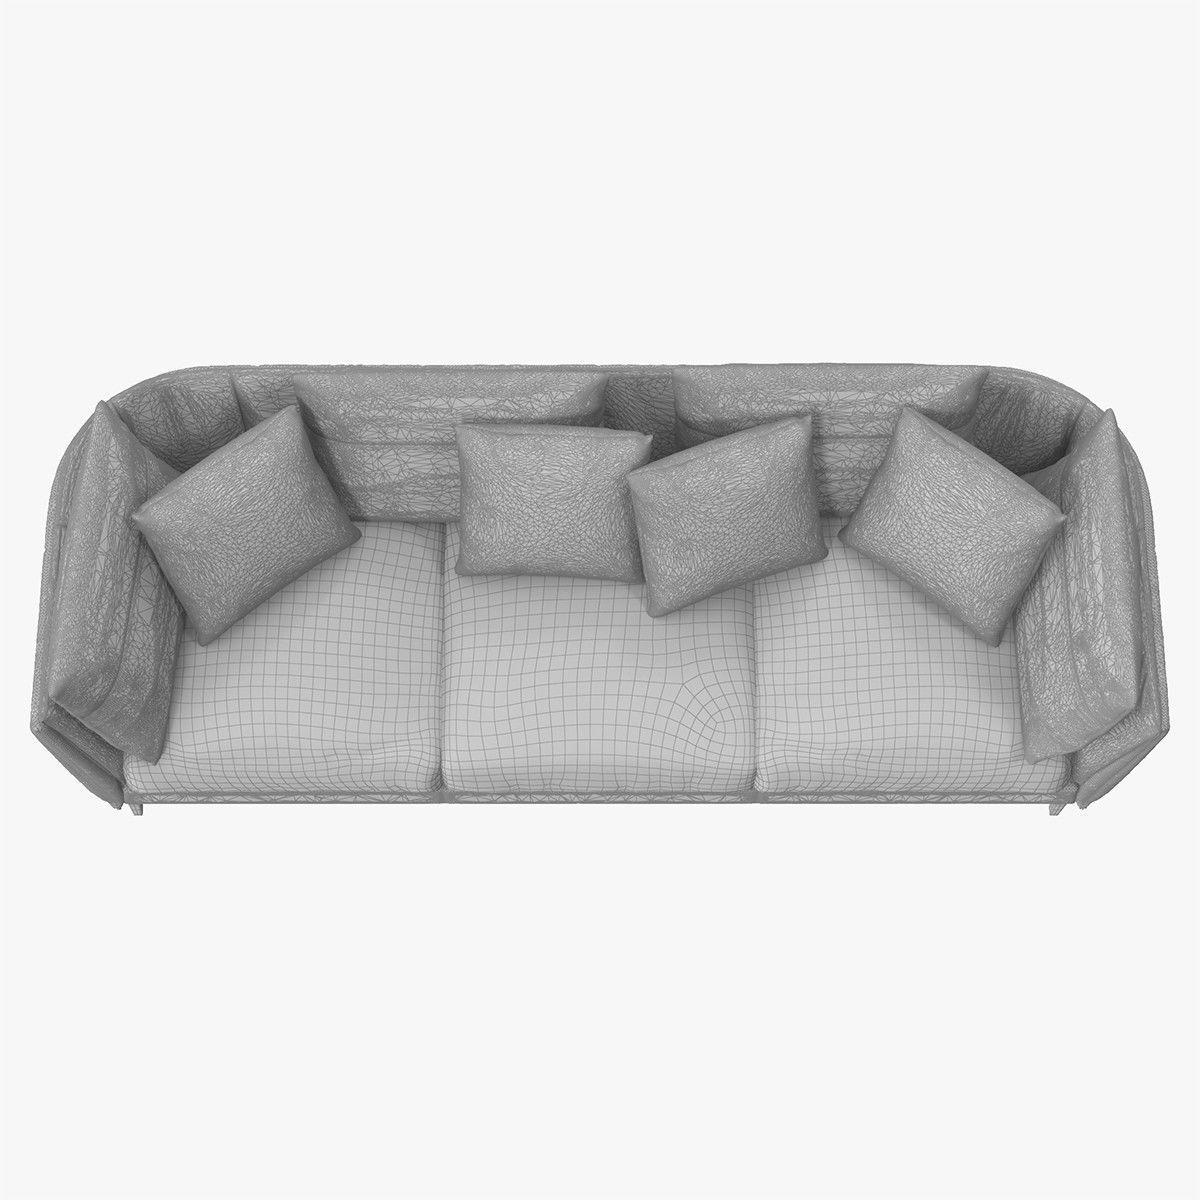 poltrona frau sofa review world market pillows bretagne 3d model max obj fbx mtl cgtrader